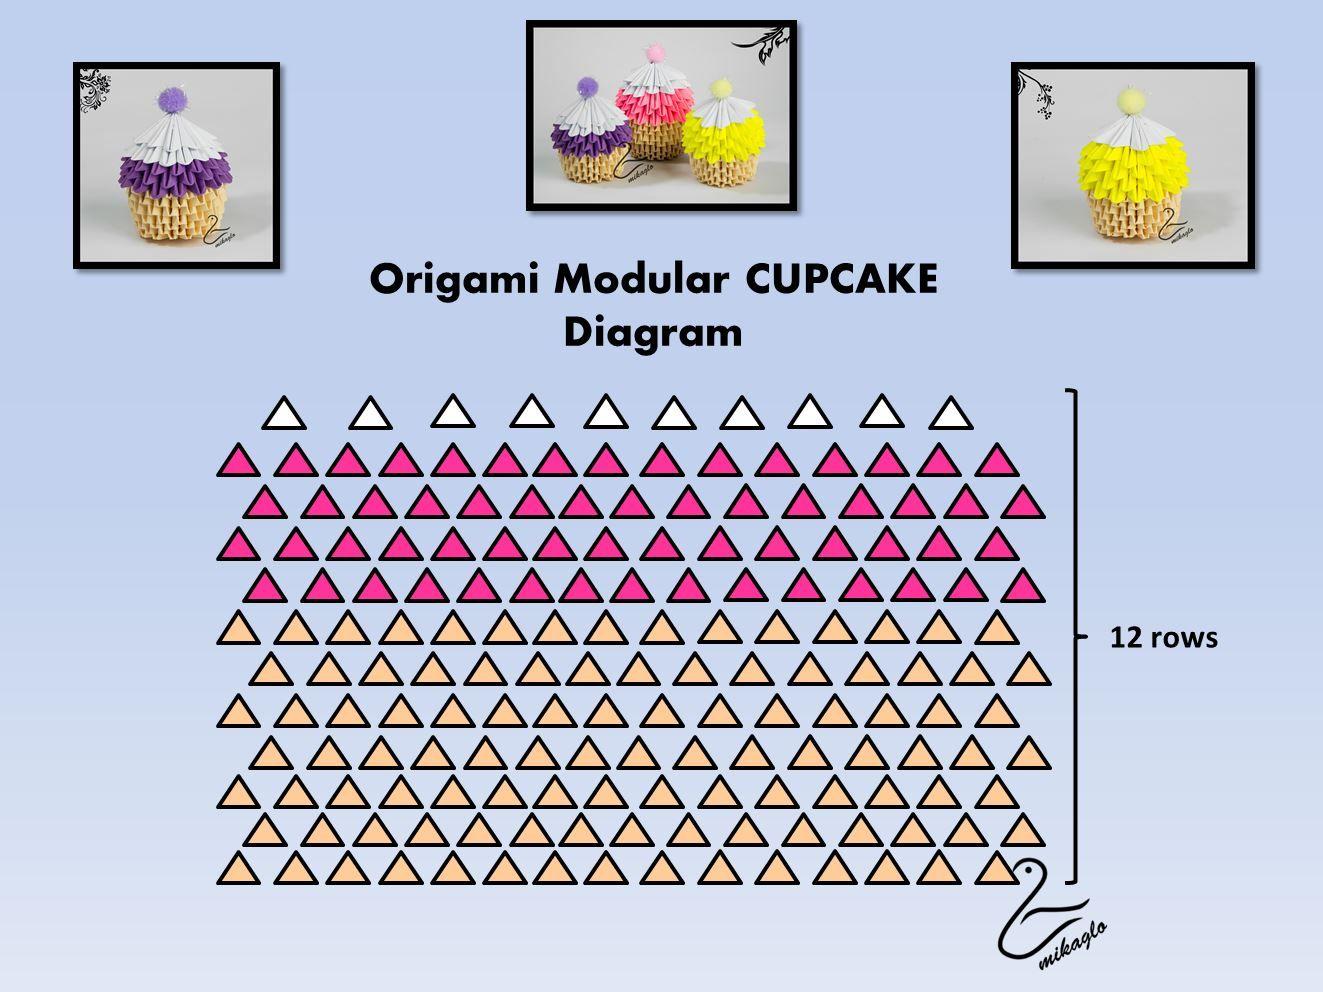 3d Origam Cupcake Tutorial Origami Pinterest Diagrams